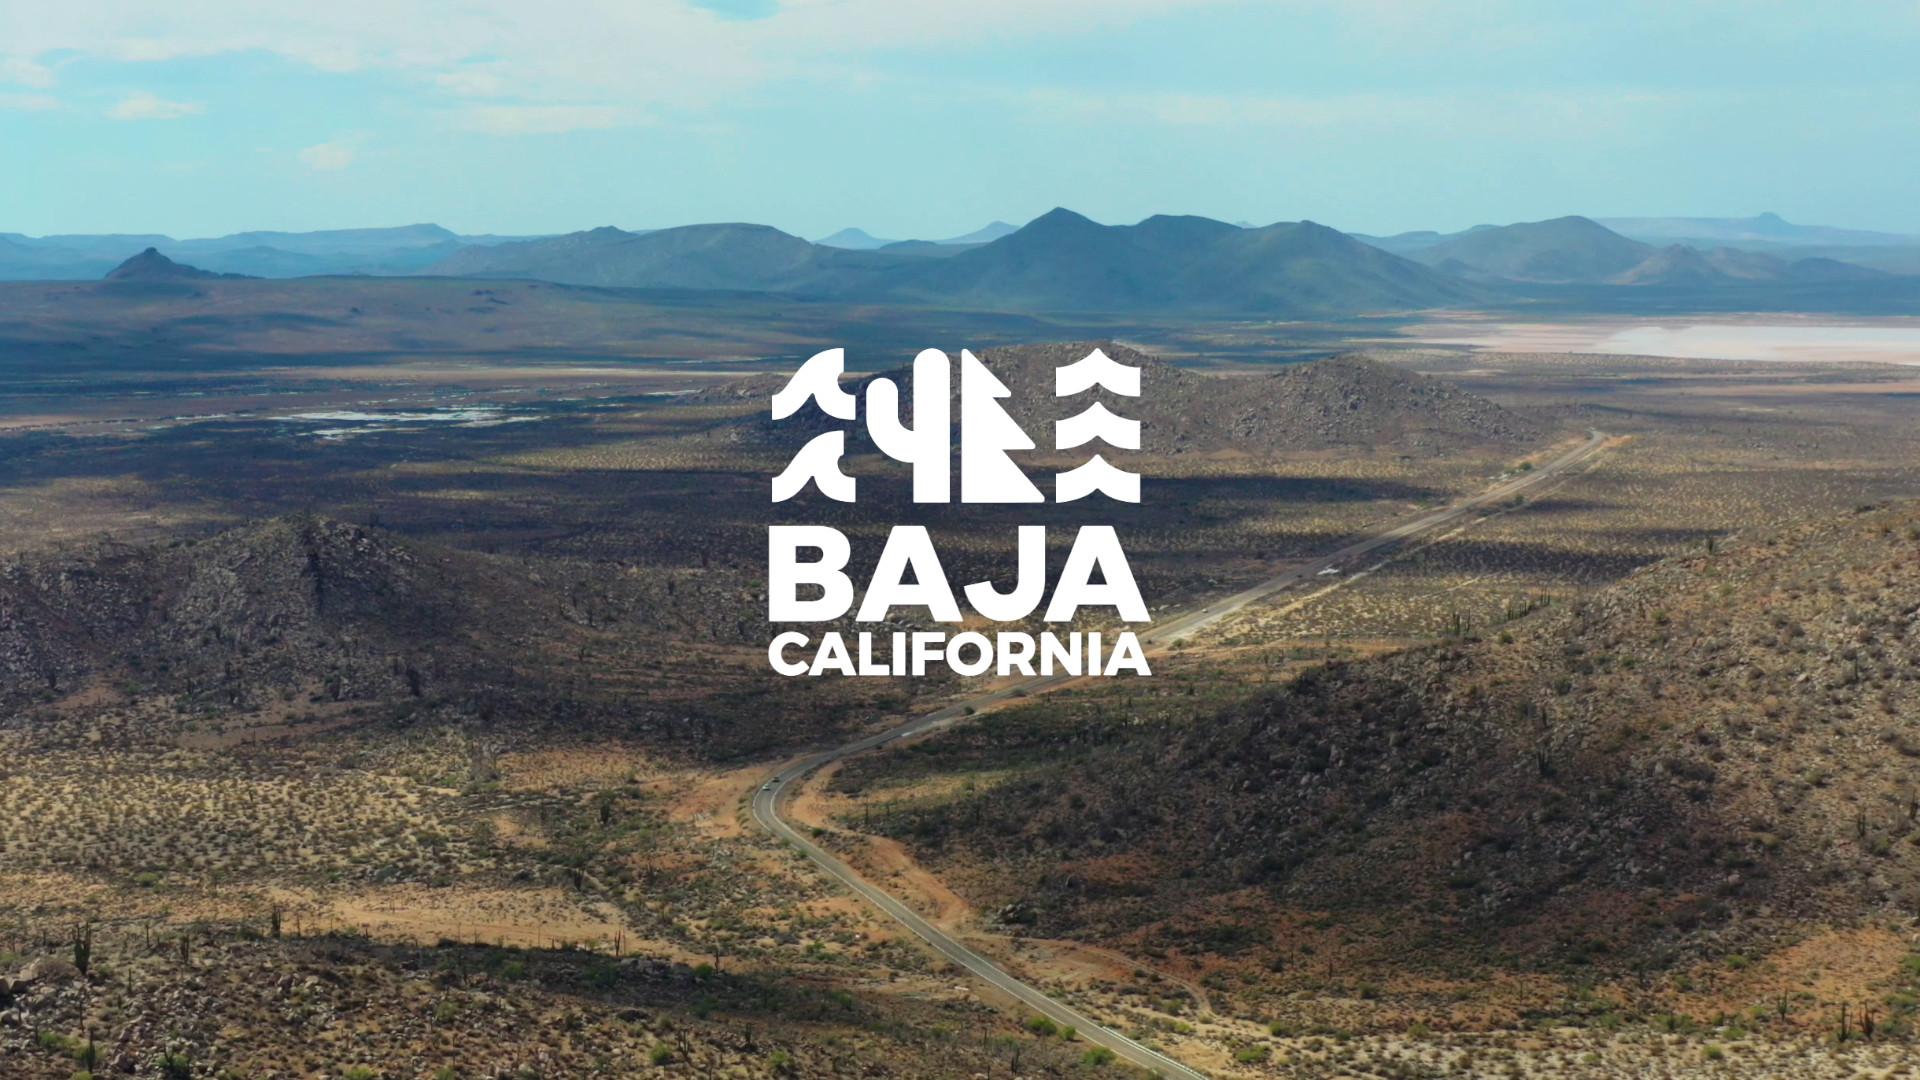 Baja California, Tourism Destination Rebranding